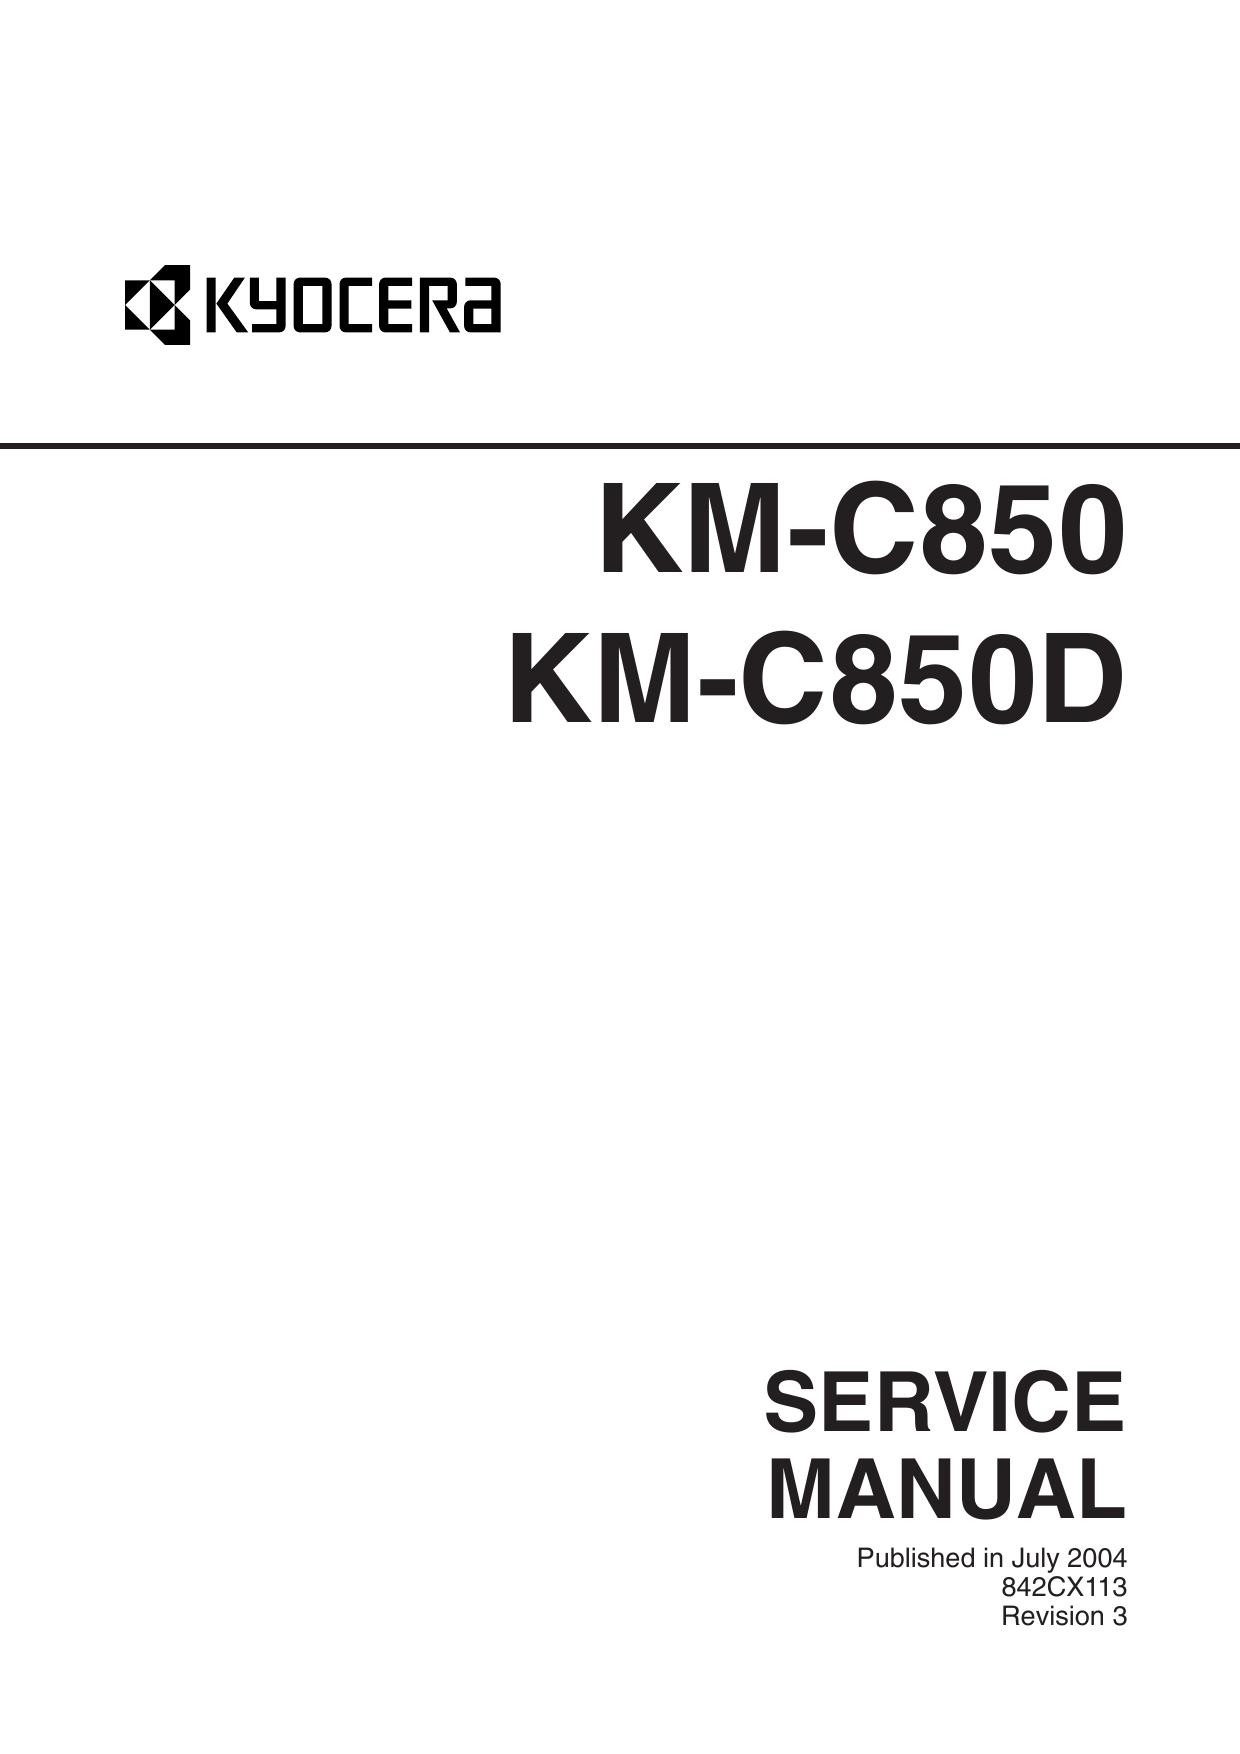 KYOCERA ColorCopier KM-C850 C850D Parts and Service Manual